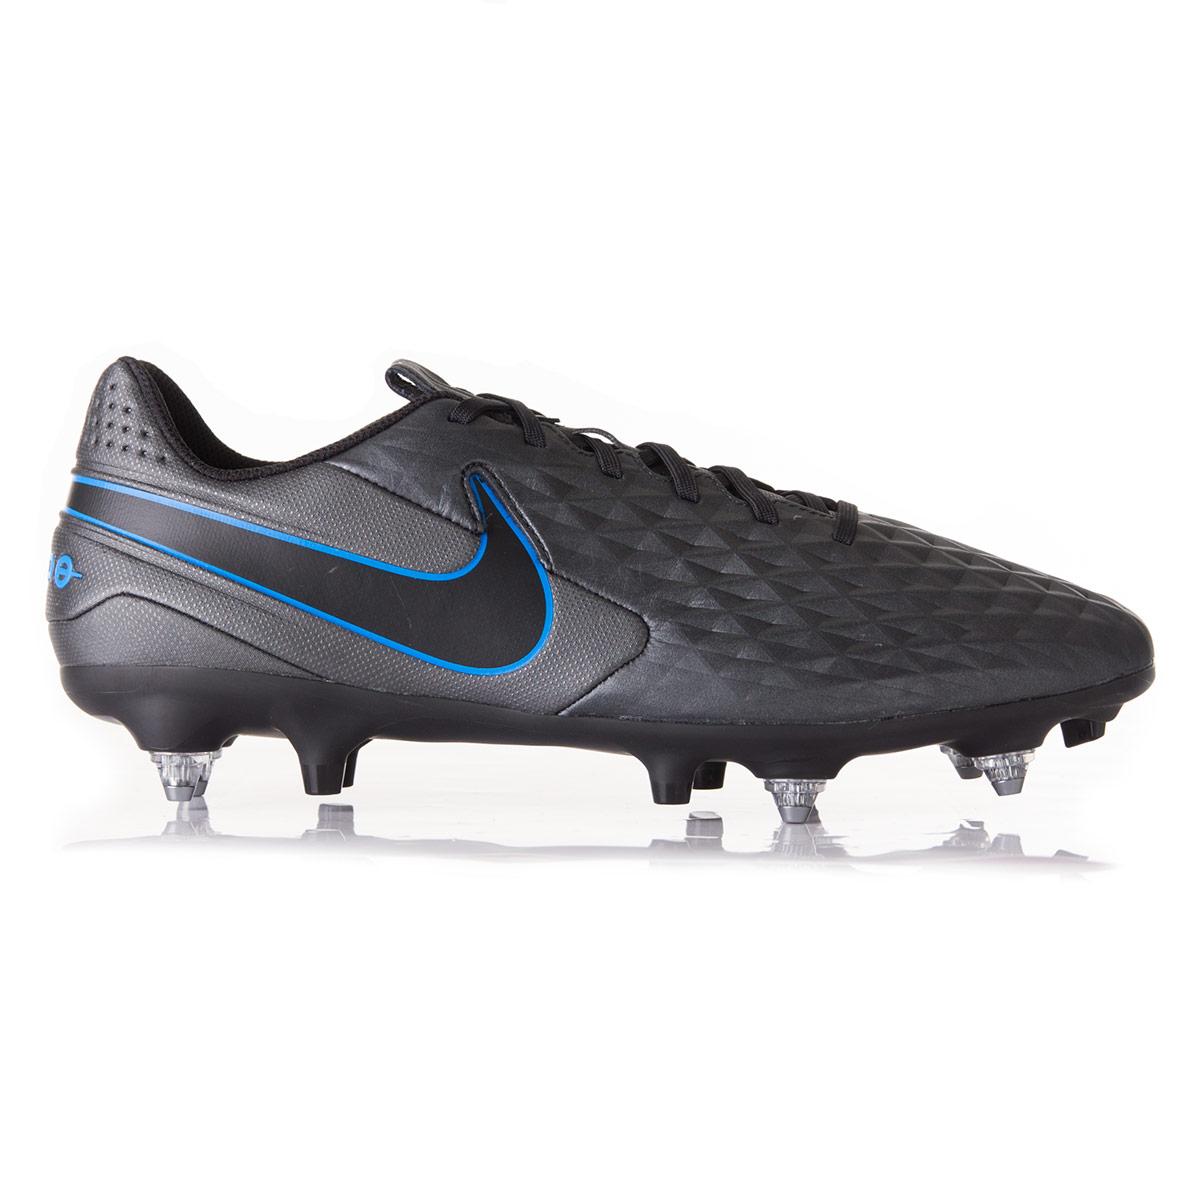 2019 real talla 7 última selección de 2019 Adults Black Nike Legend 8 Academy SG Boots | rugbystore